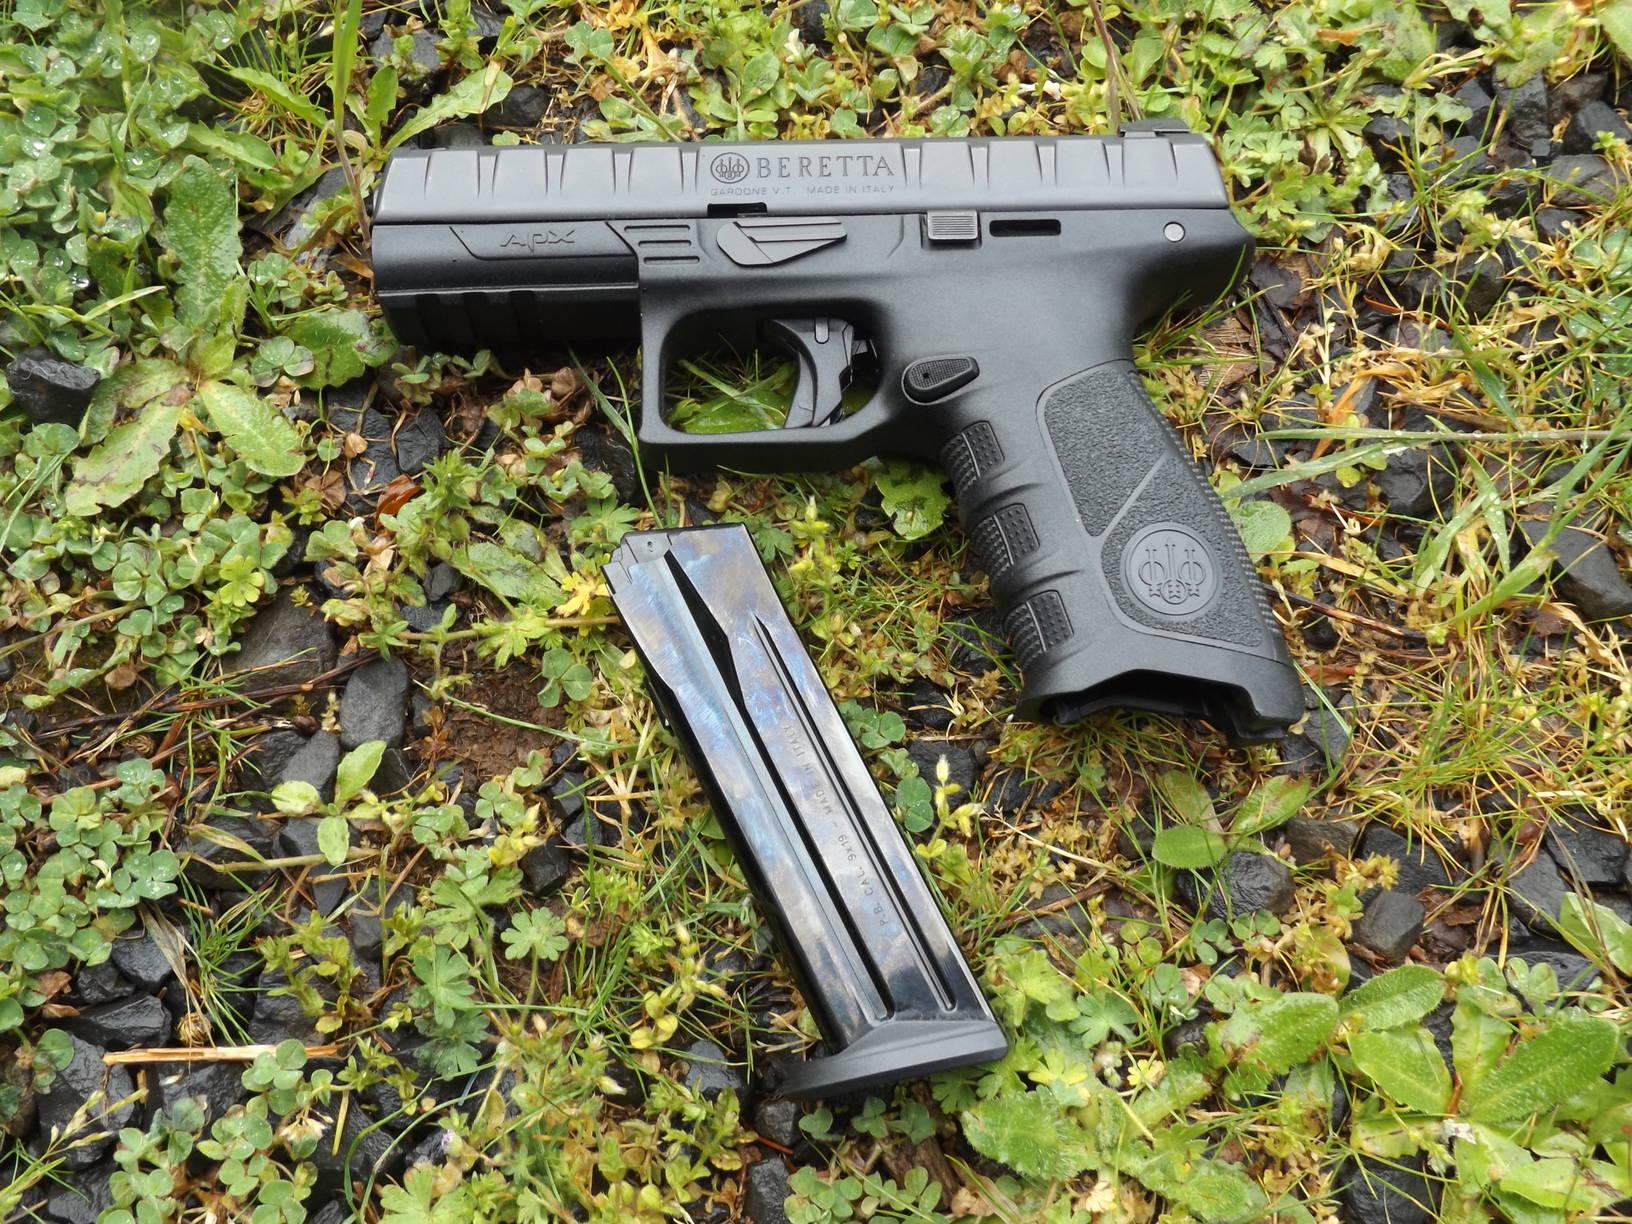 Beretta APX 9mm Handgun, by Pat Cascio